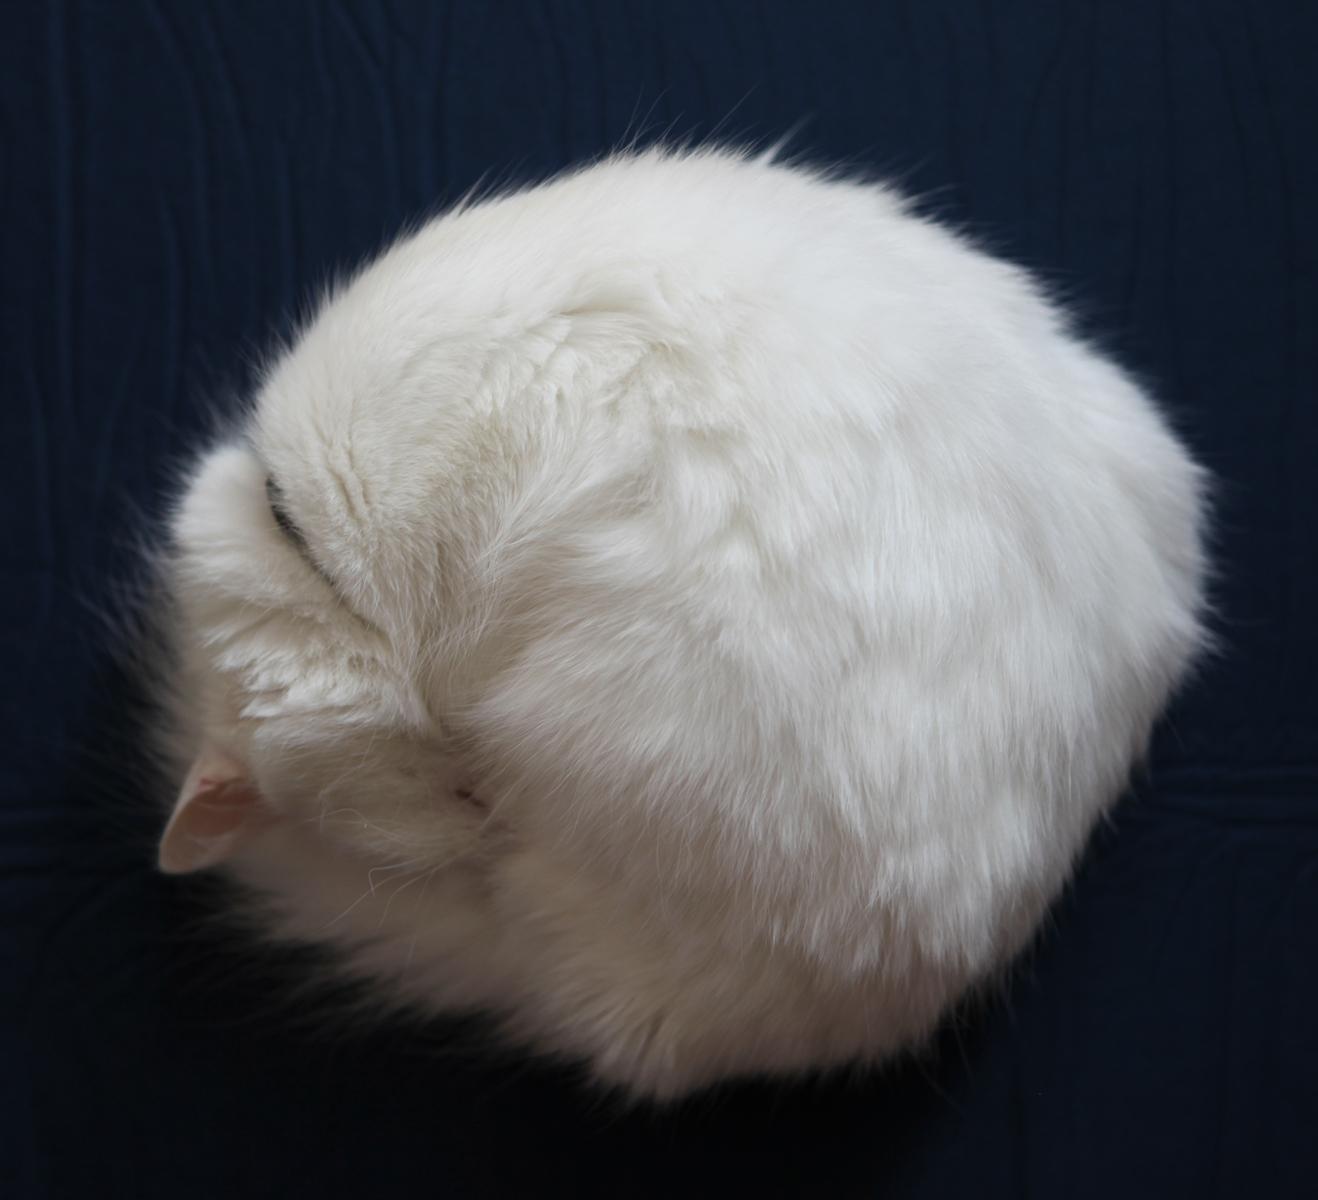 round cat, Cat, Close-up, Domestic, Fluffy, HQ Photo